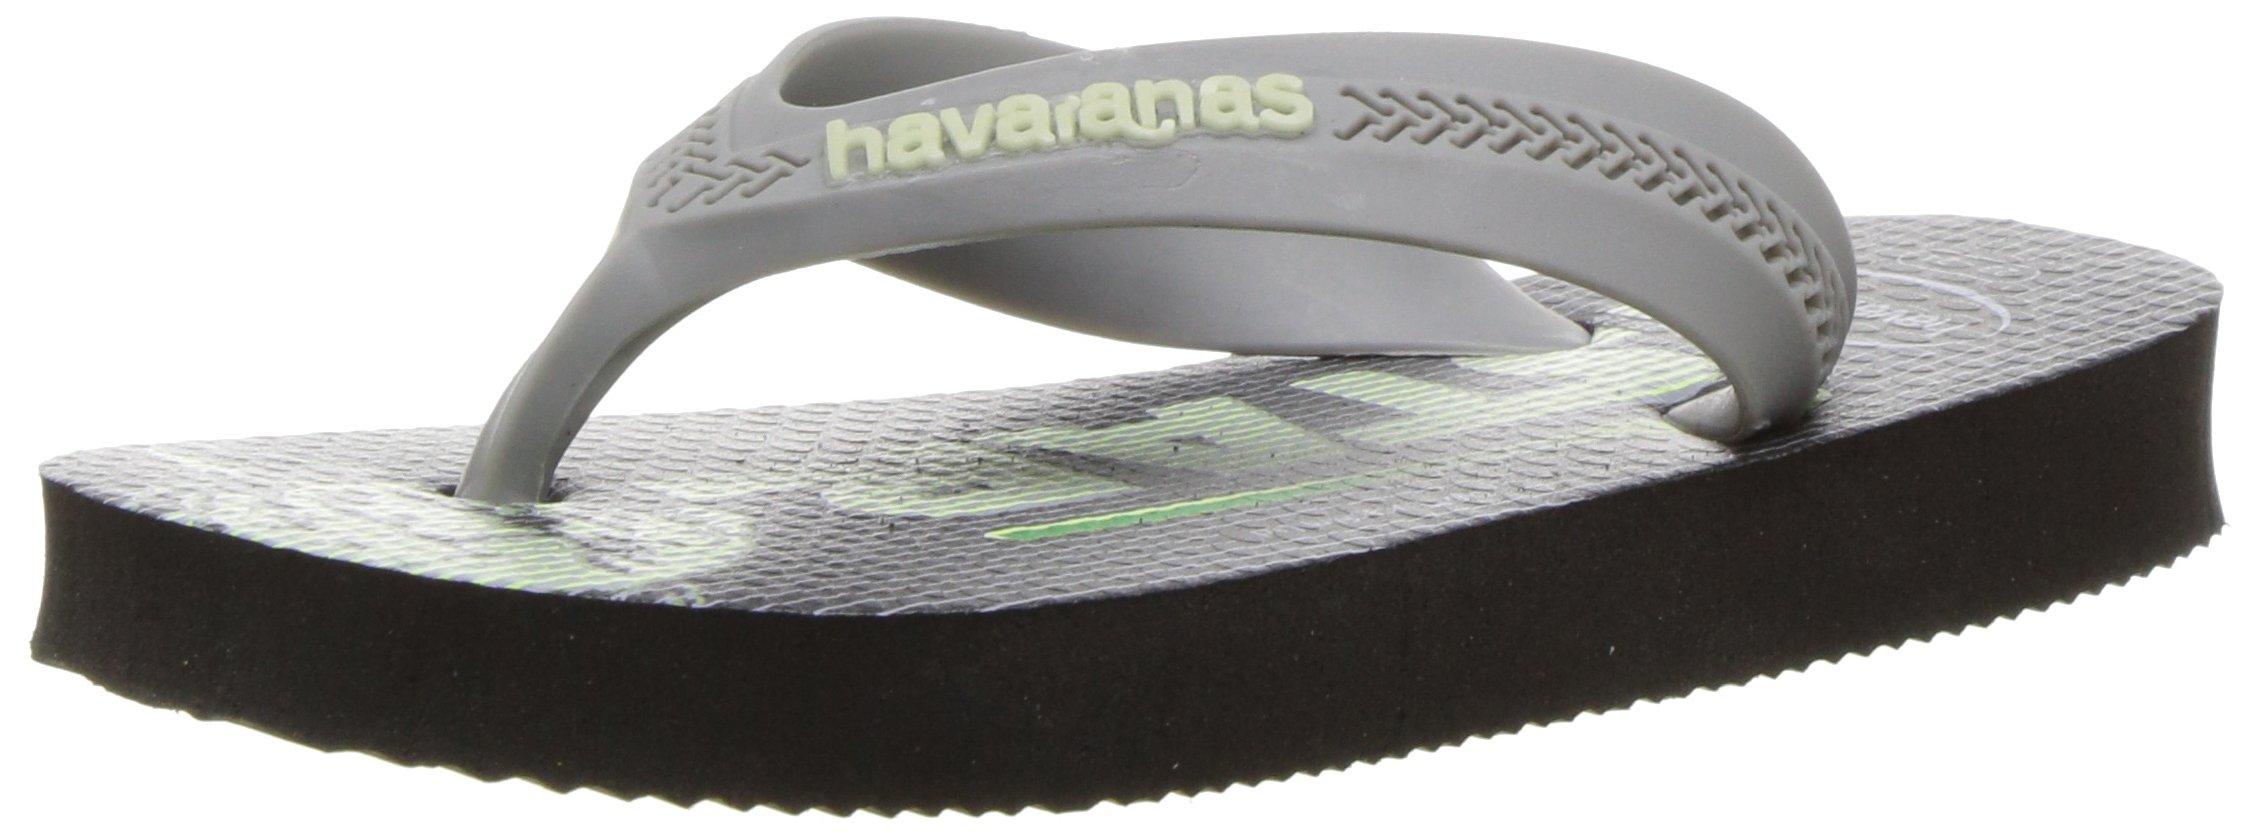 2ff427c25 Get Quotations · Havaianas Kids  Max Star Wars Sandal Black Flip Flop